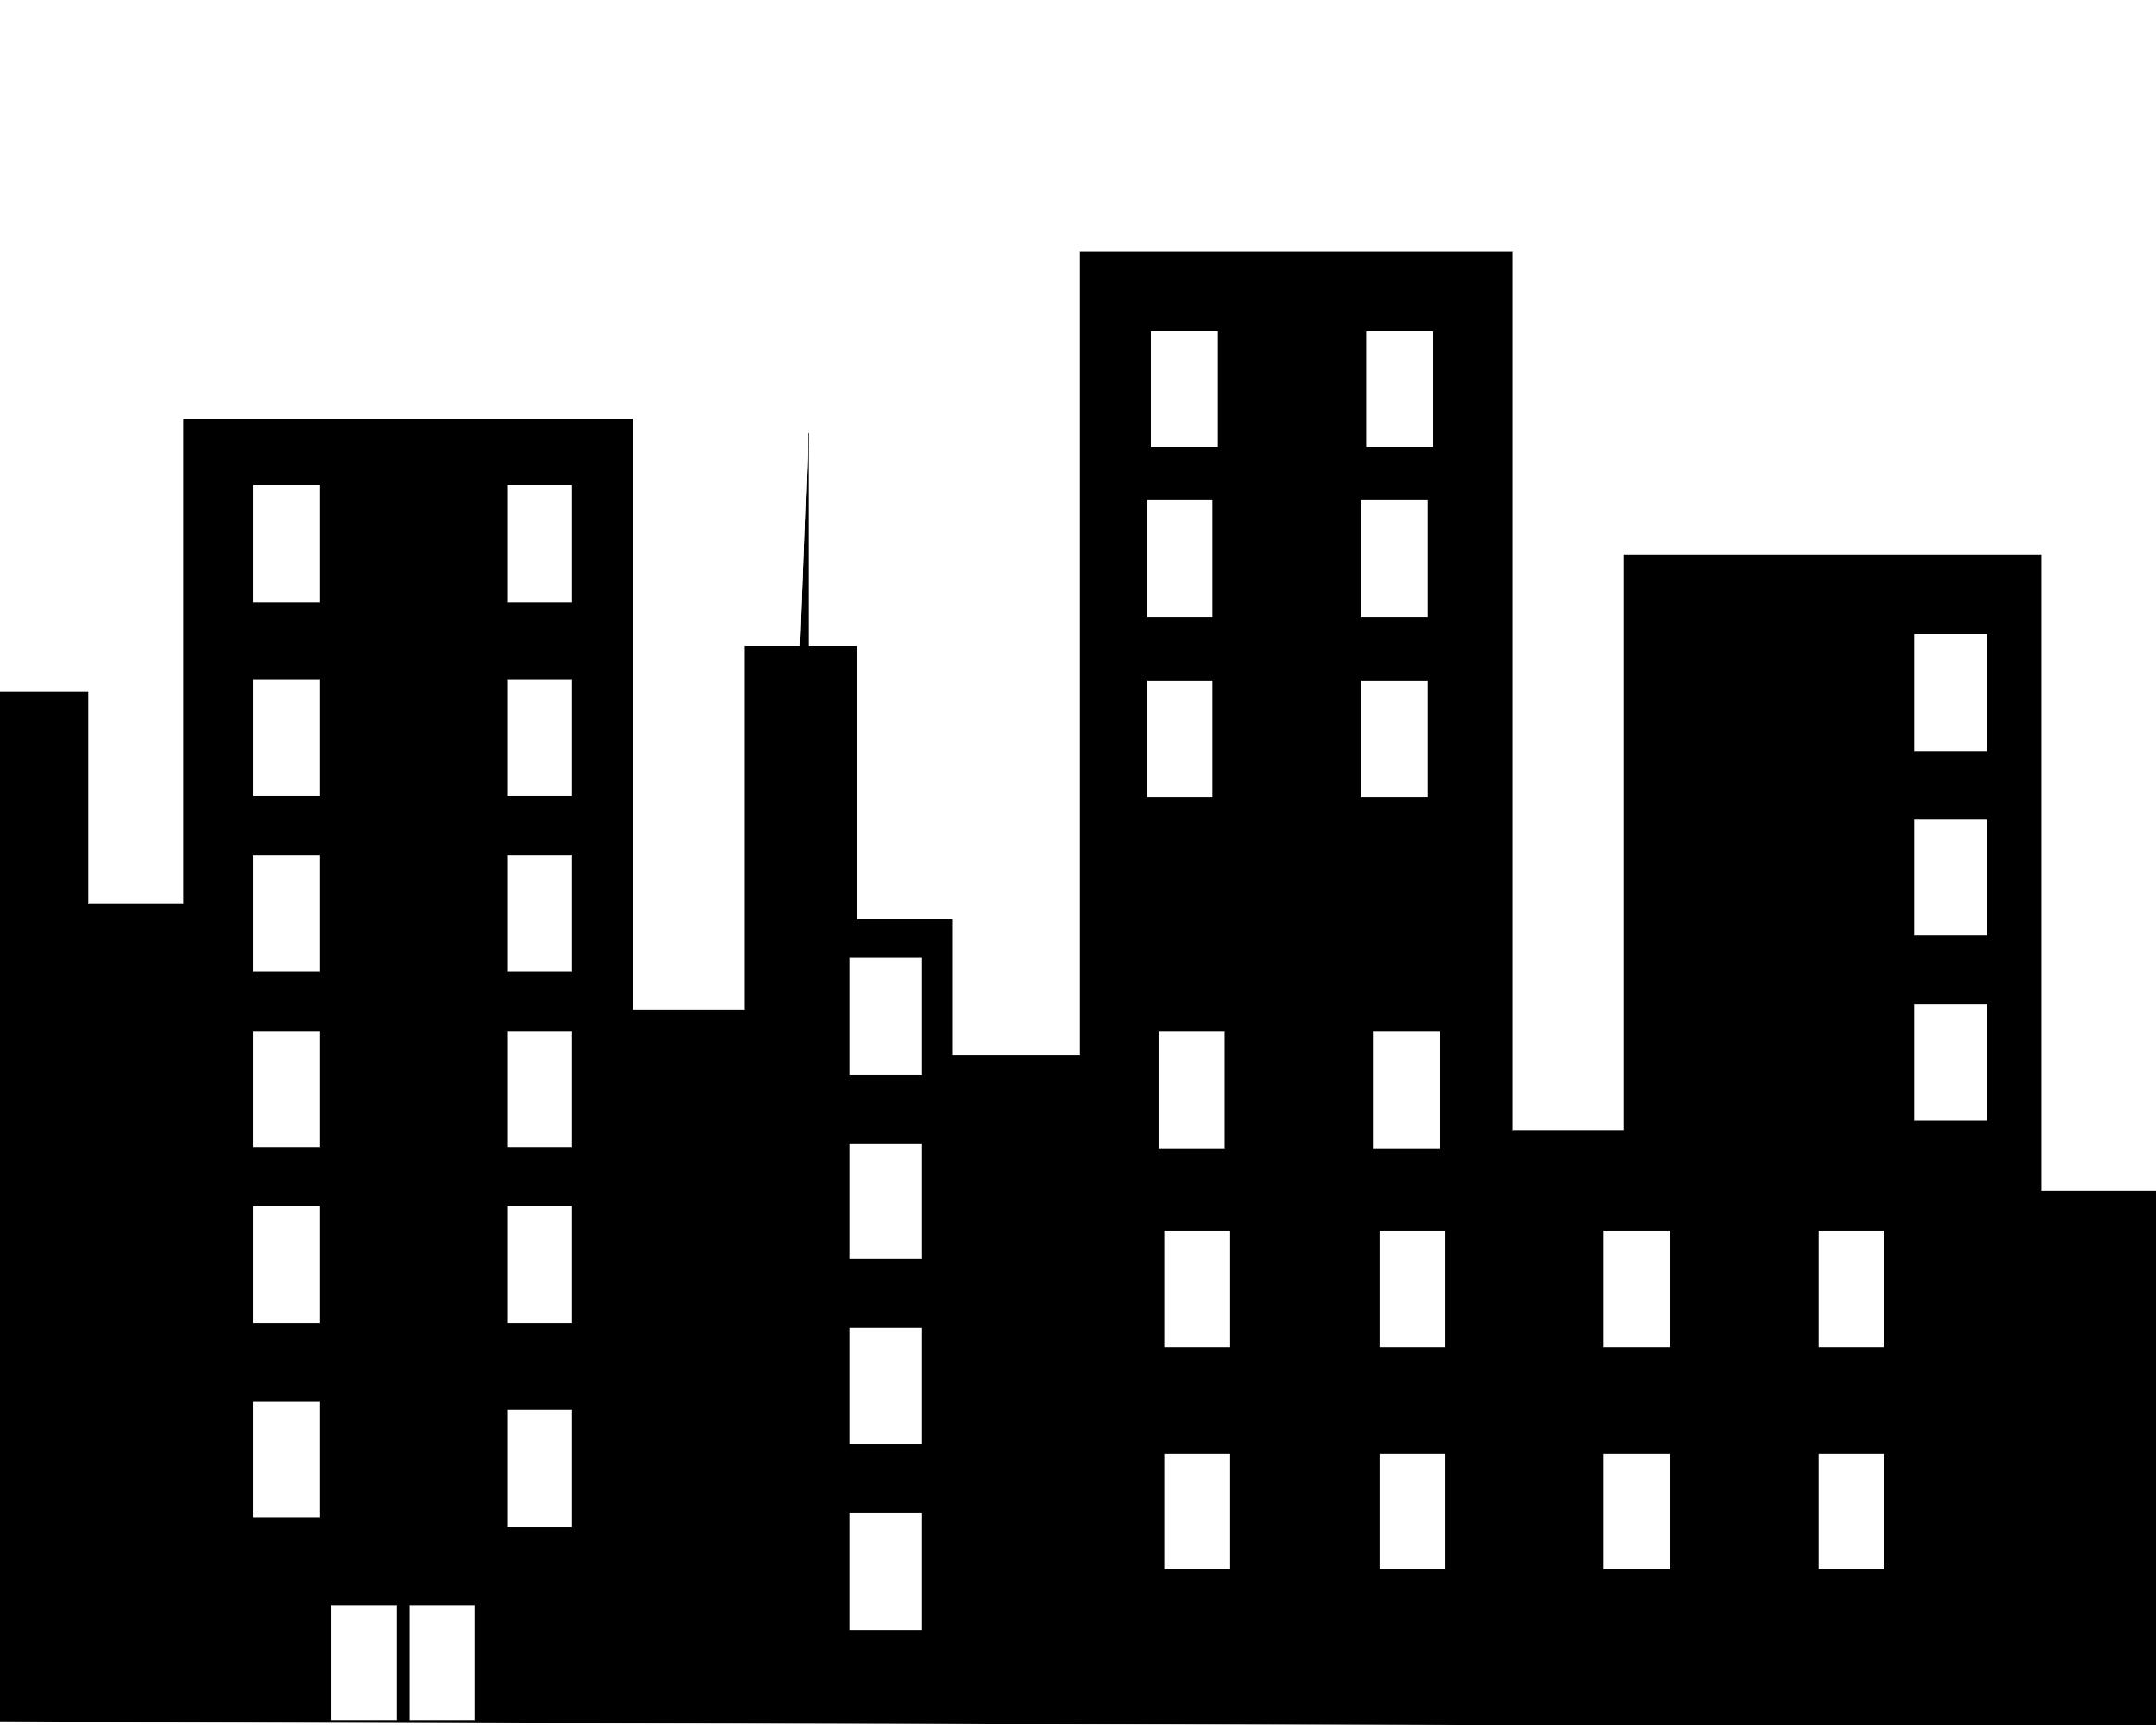 Buildings clipart Fresh Black Building Cliparts Free.